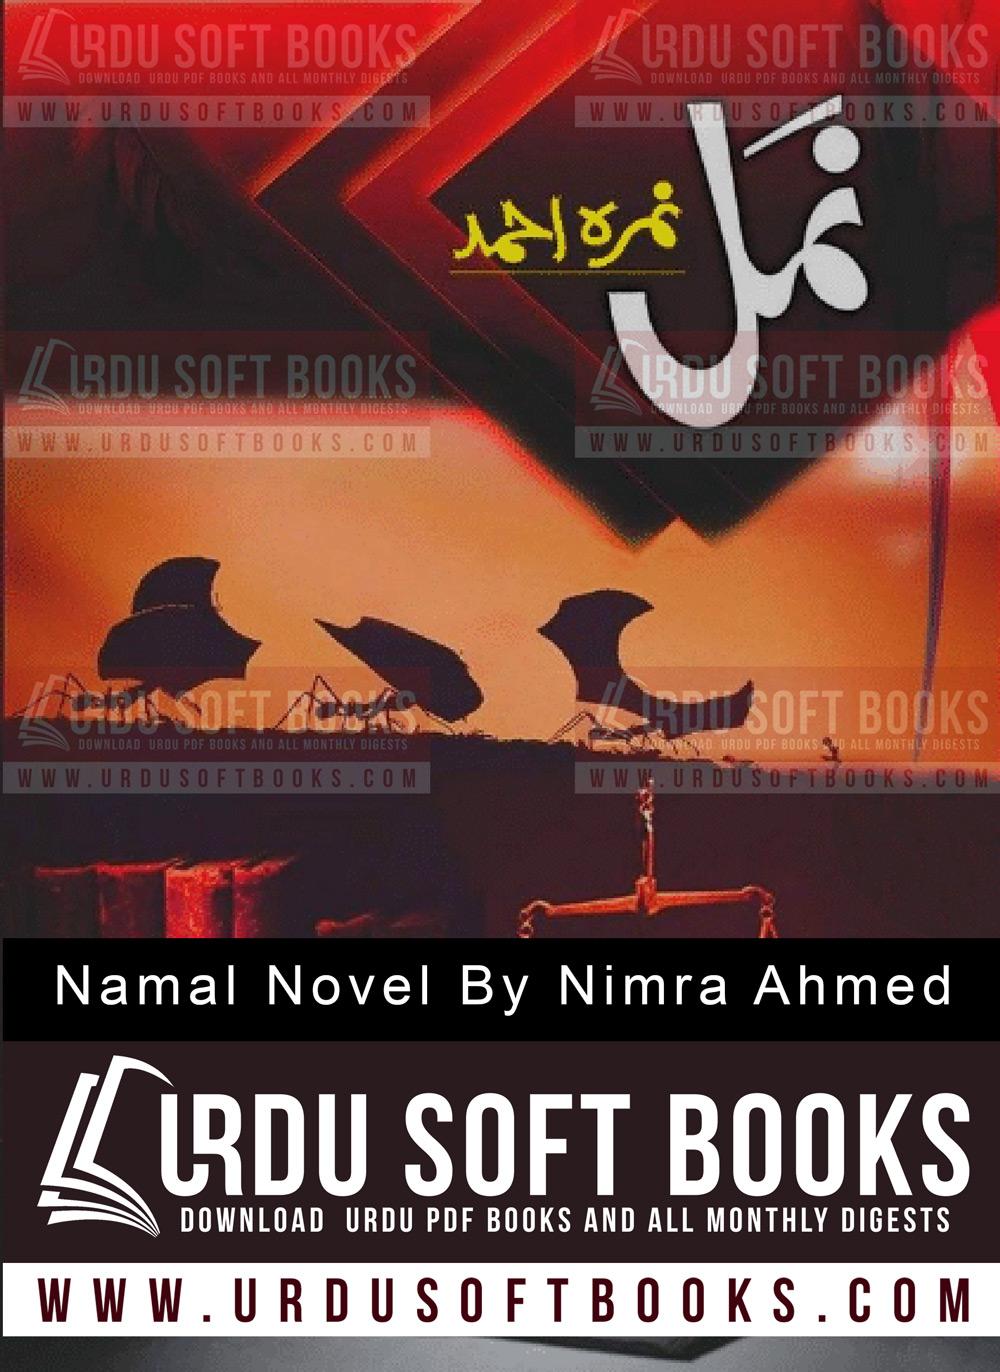 Namal Novel by Nimra Ahmed